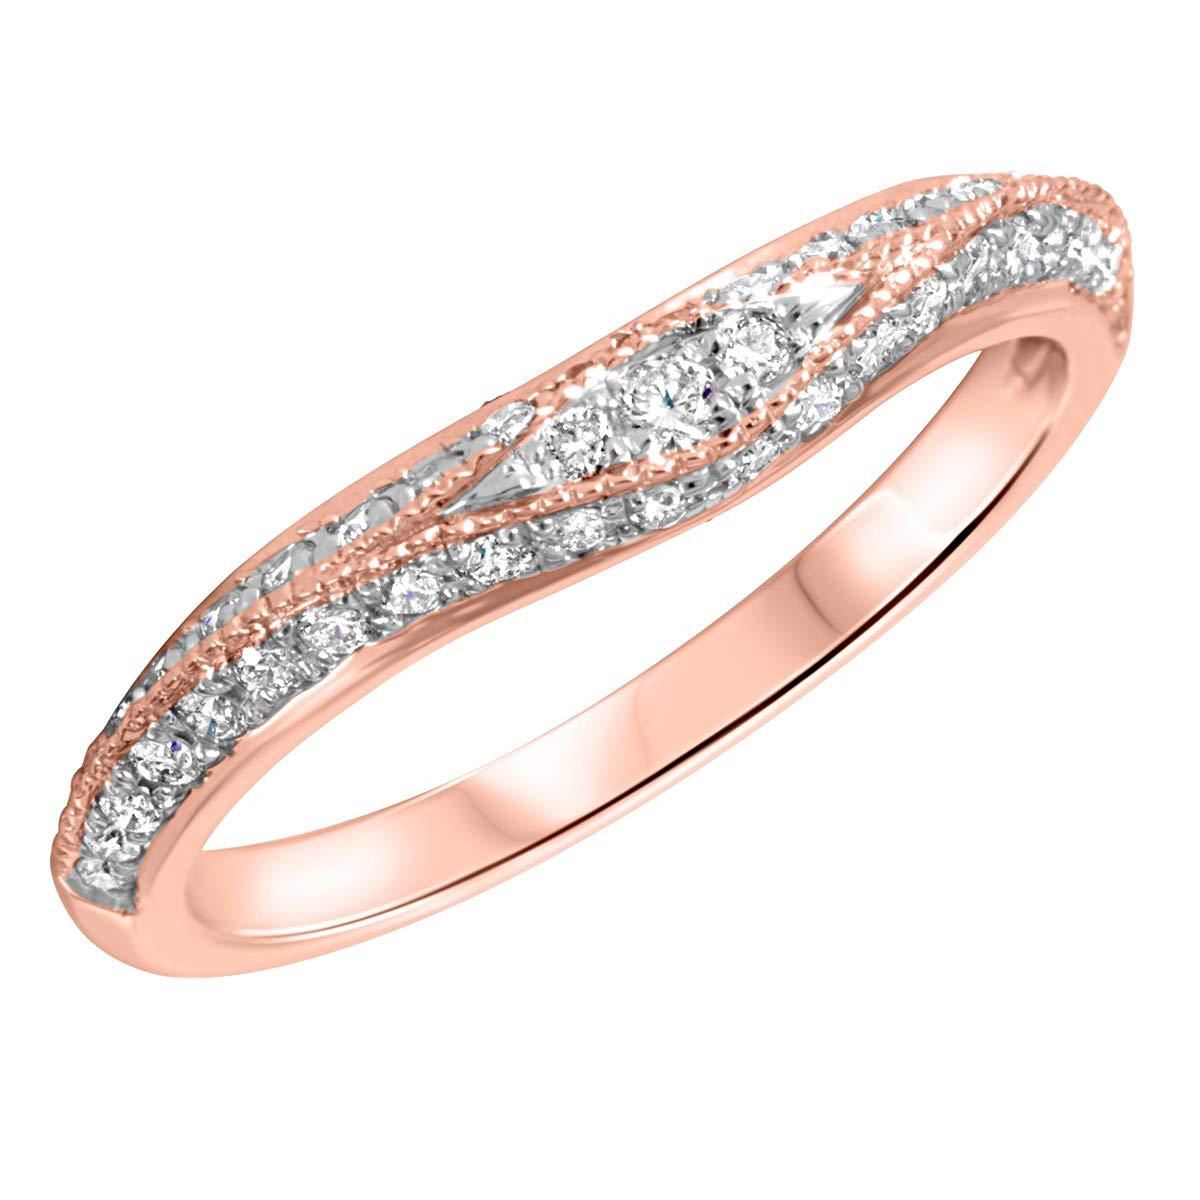 0.30 Ct Round Cut Simulated Diamond Milgrain Wedding Band 14k Real Gold